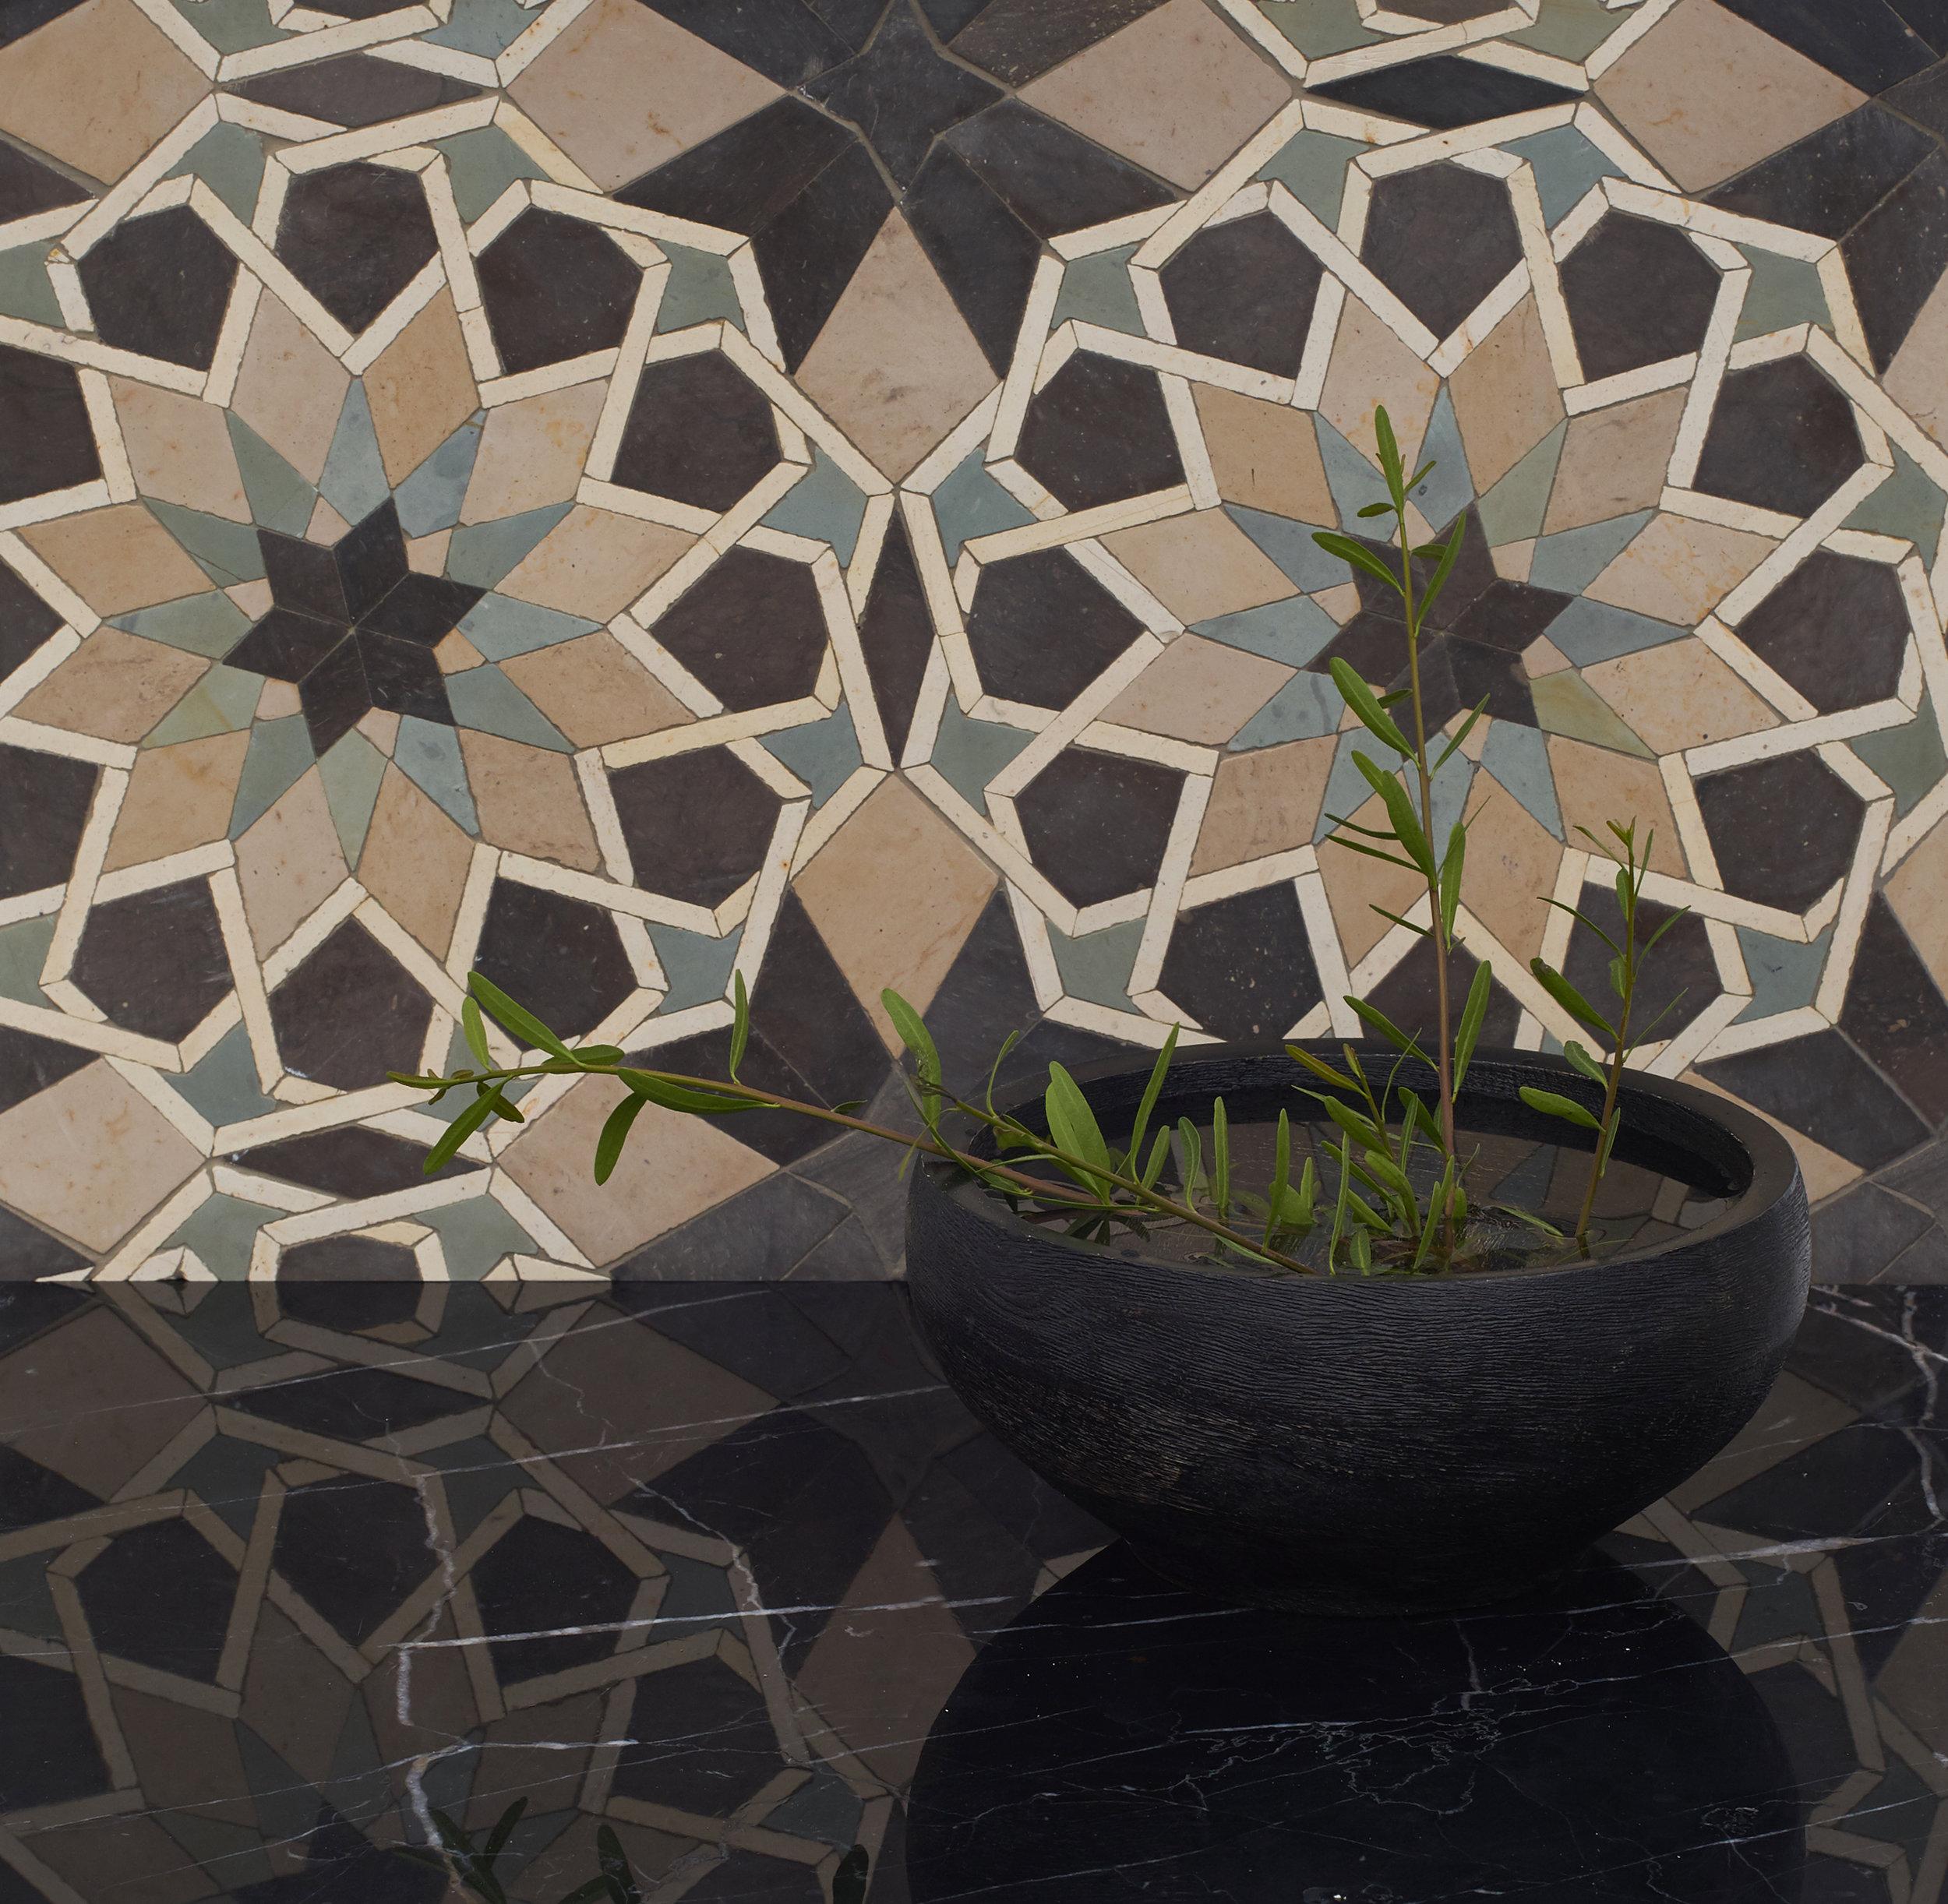 MS - Marble Systems - Baba Chic Laila - Mosaic - Backsplash.jpg